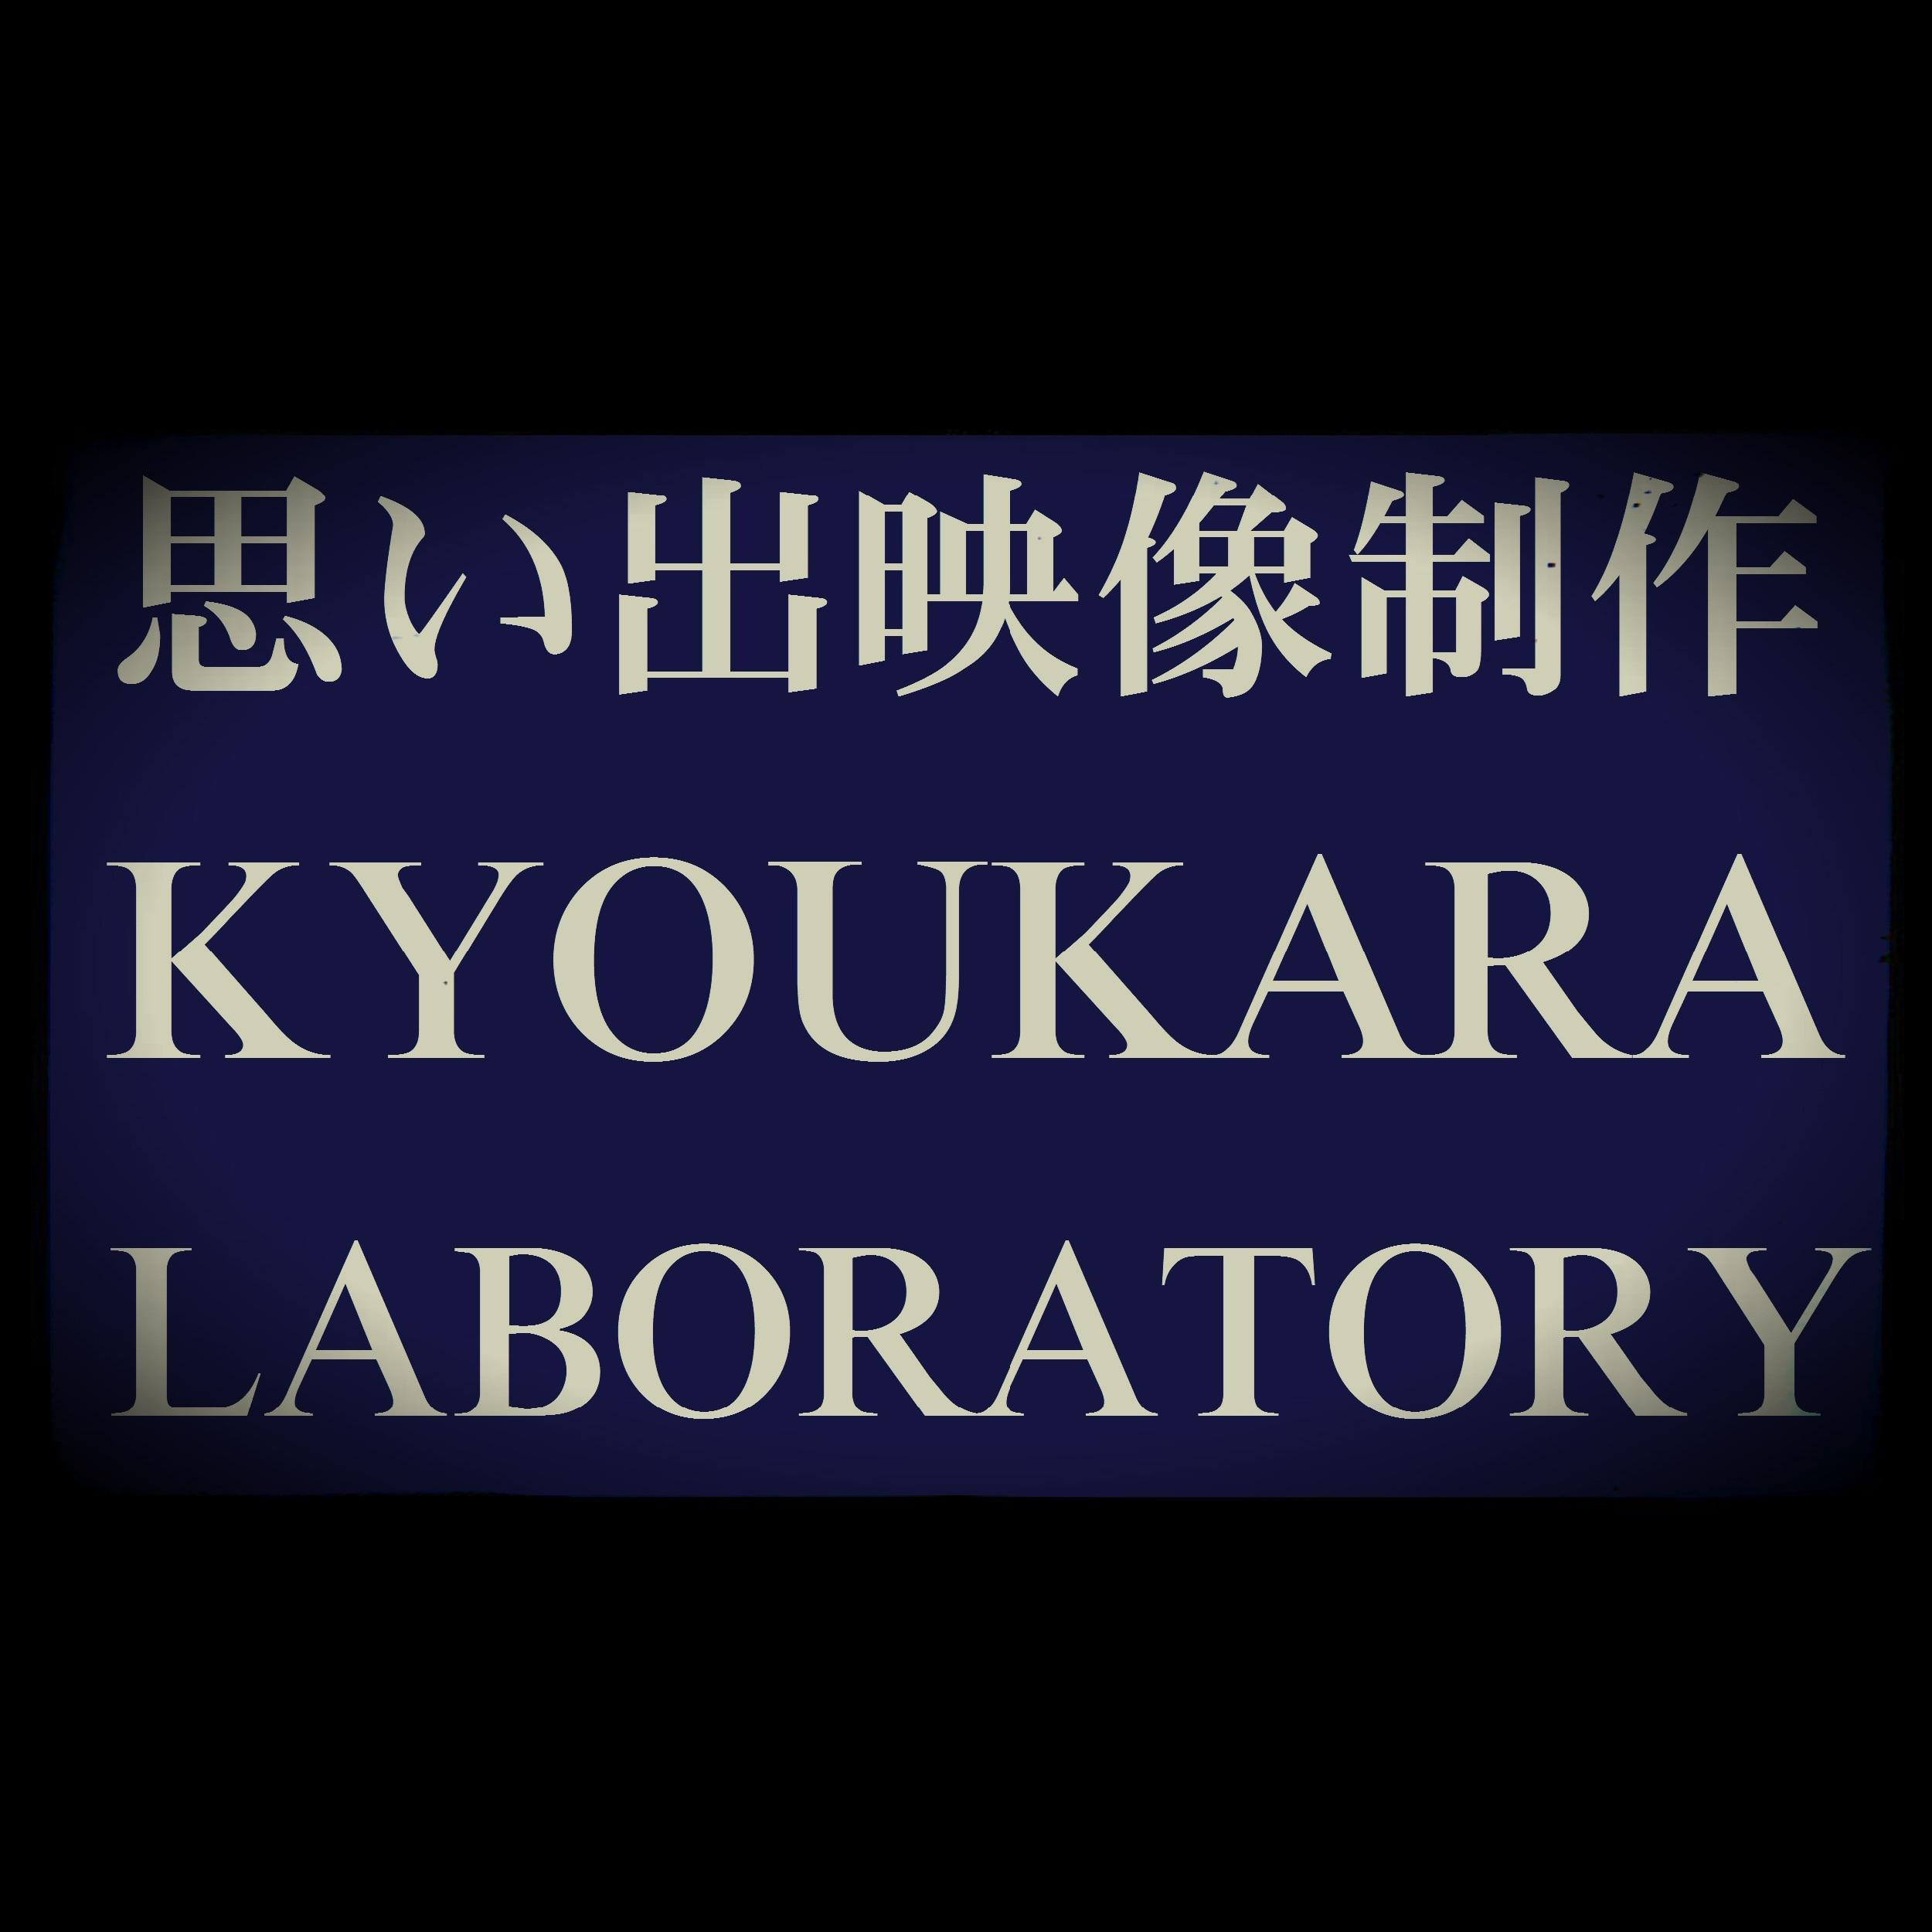 Kyoukara Laboratory